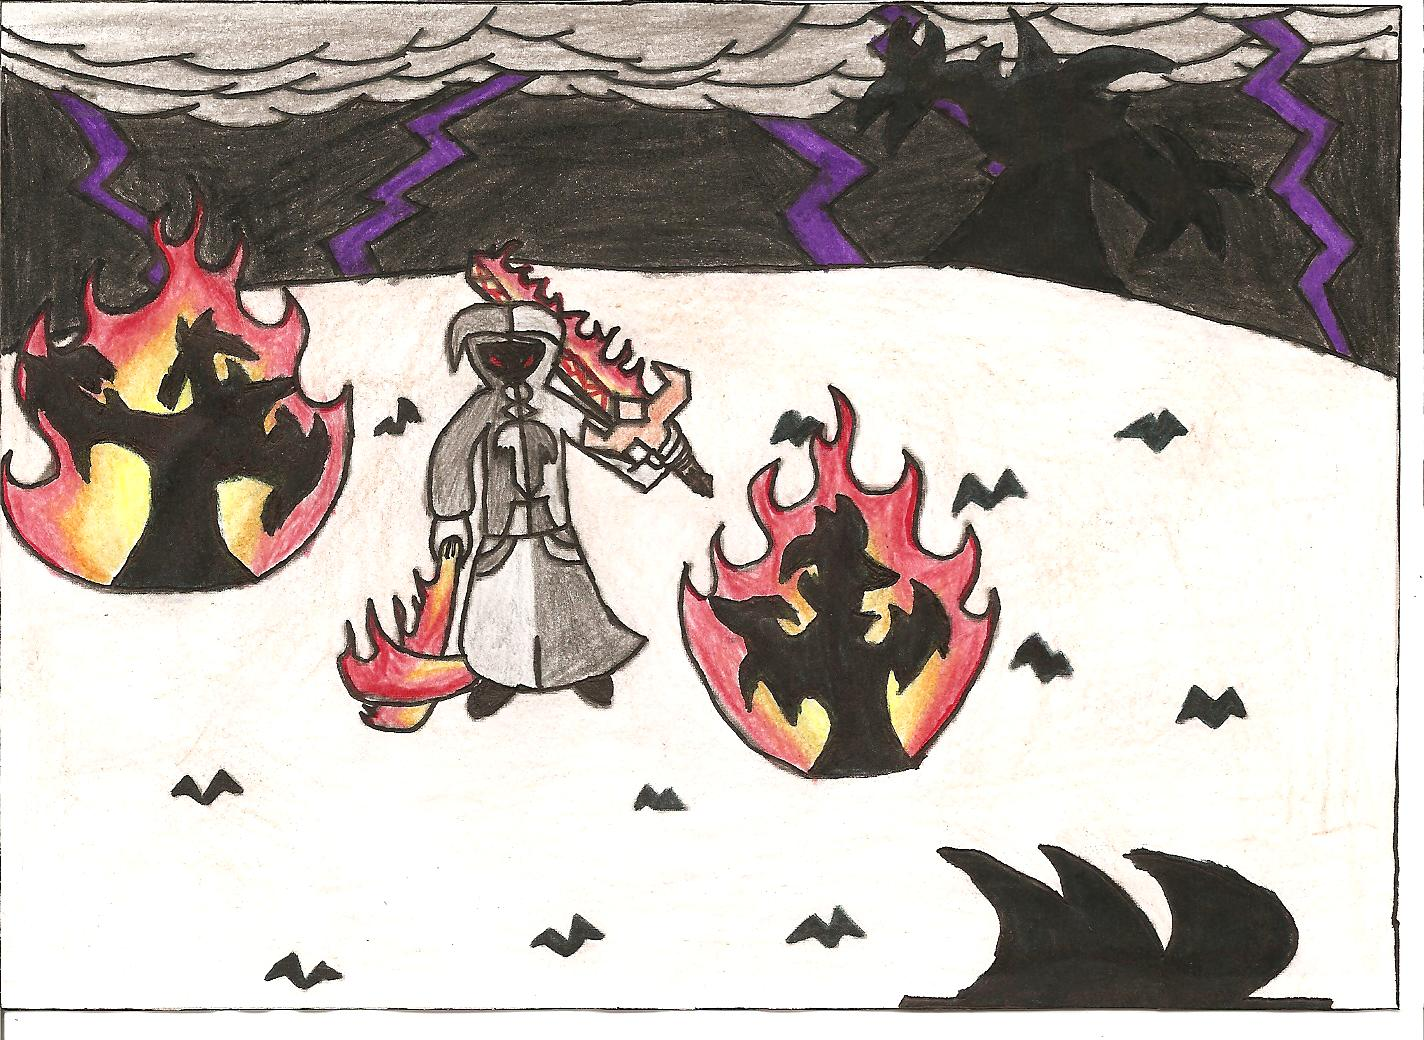 Dax's destructive path